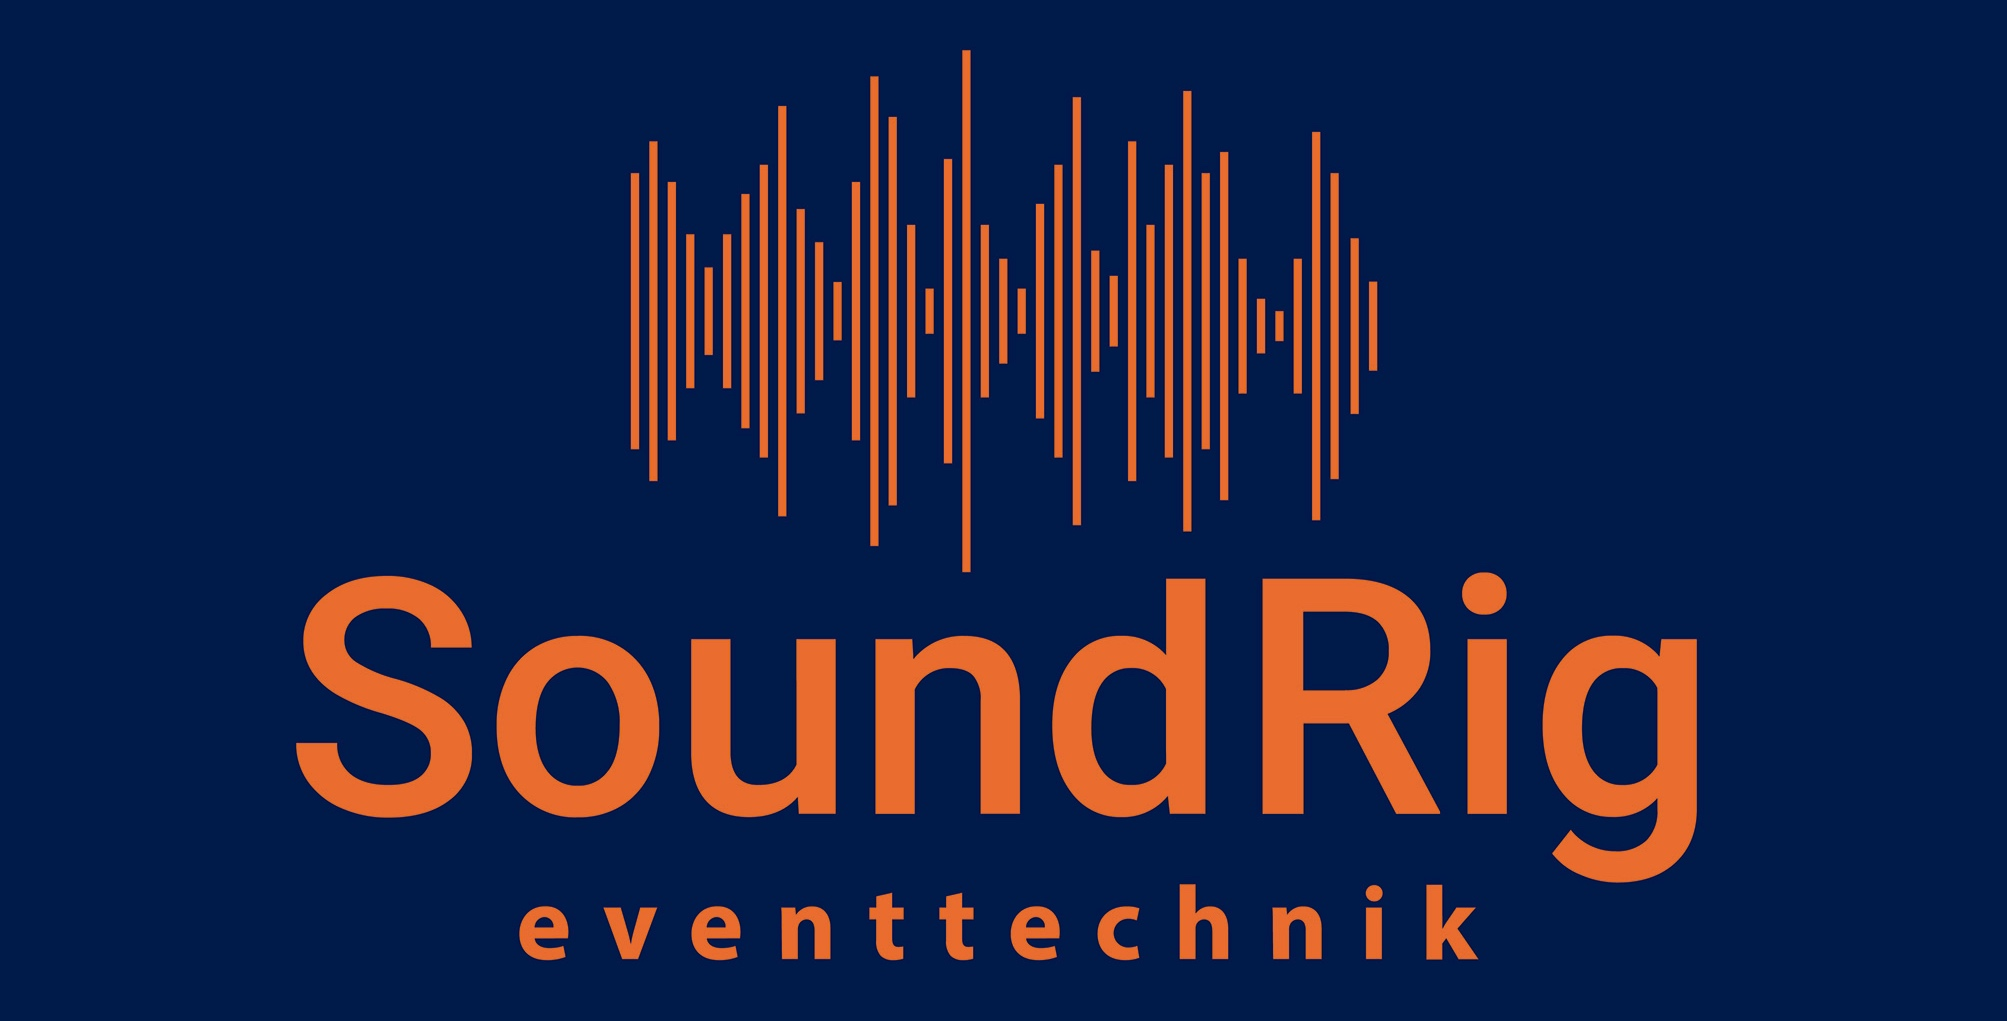 SoundRig-02.jpg